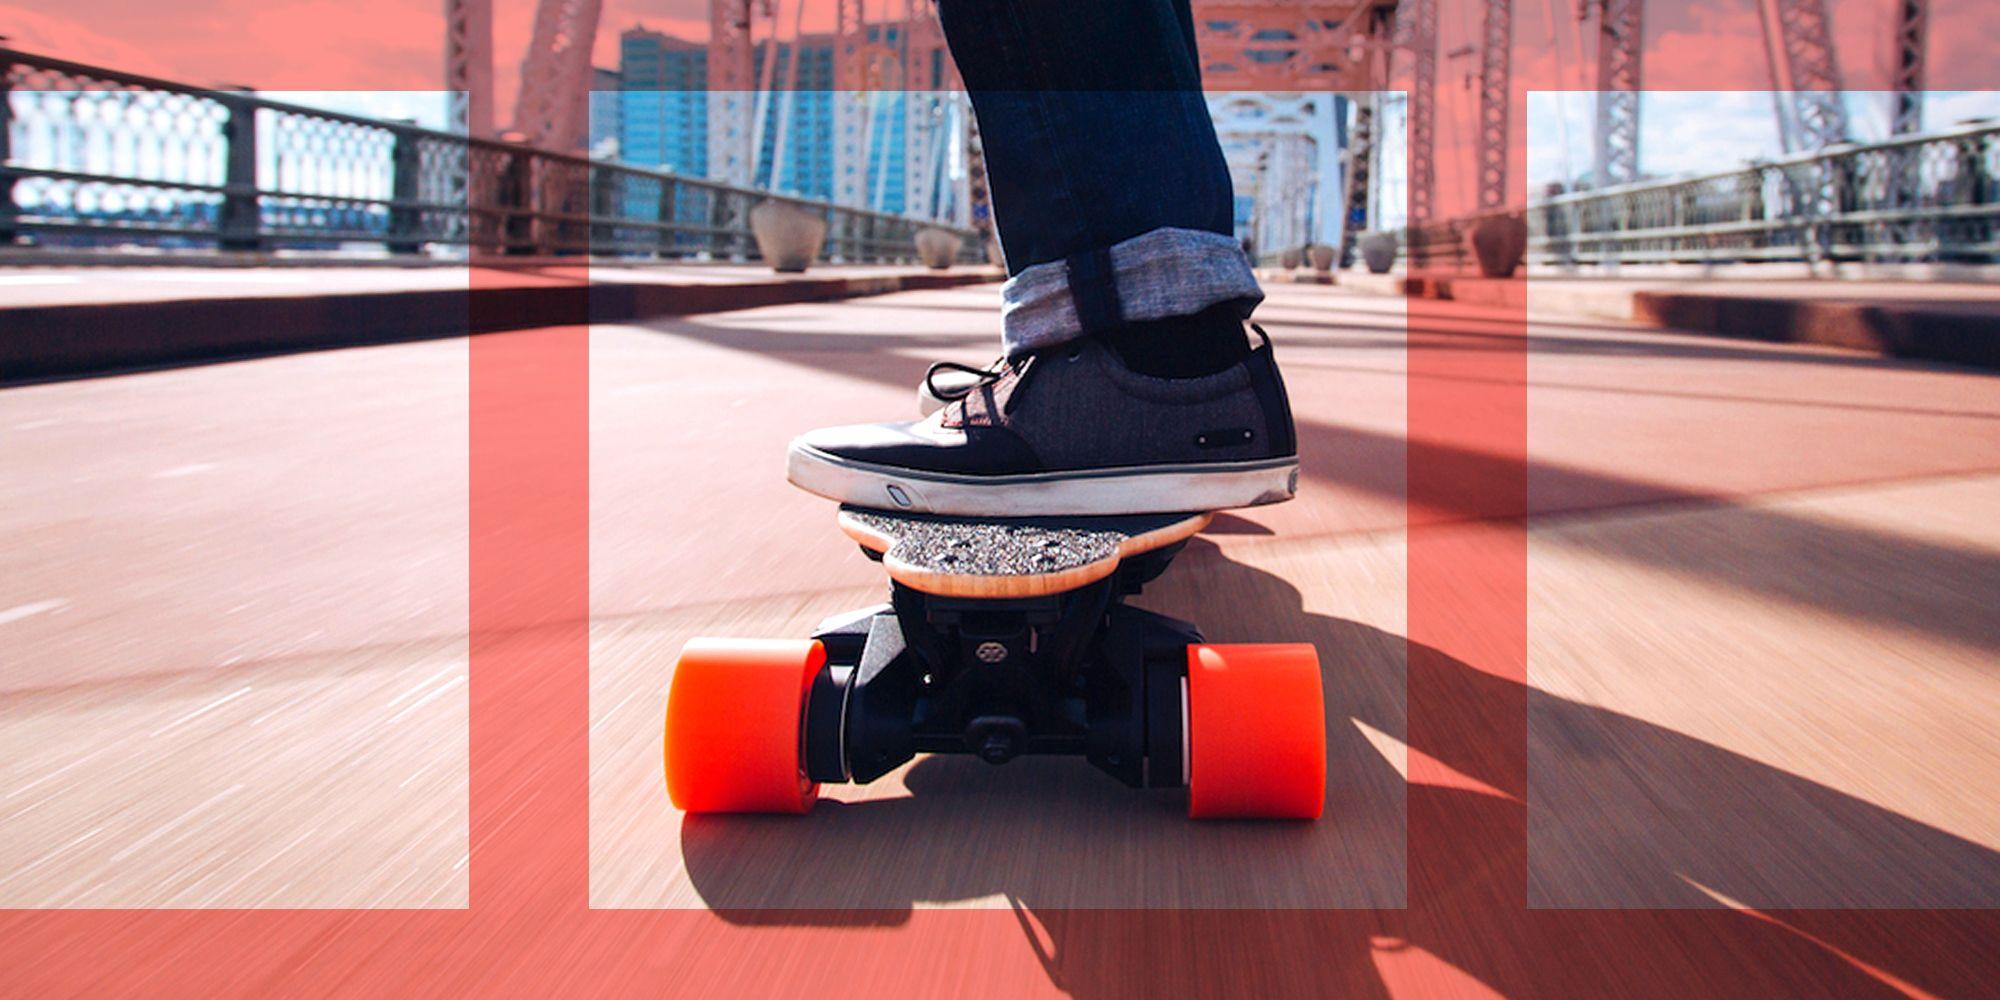 9 Best Electric Skateboards of 2018 - Motorized Skateboards